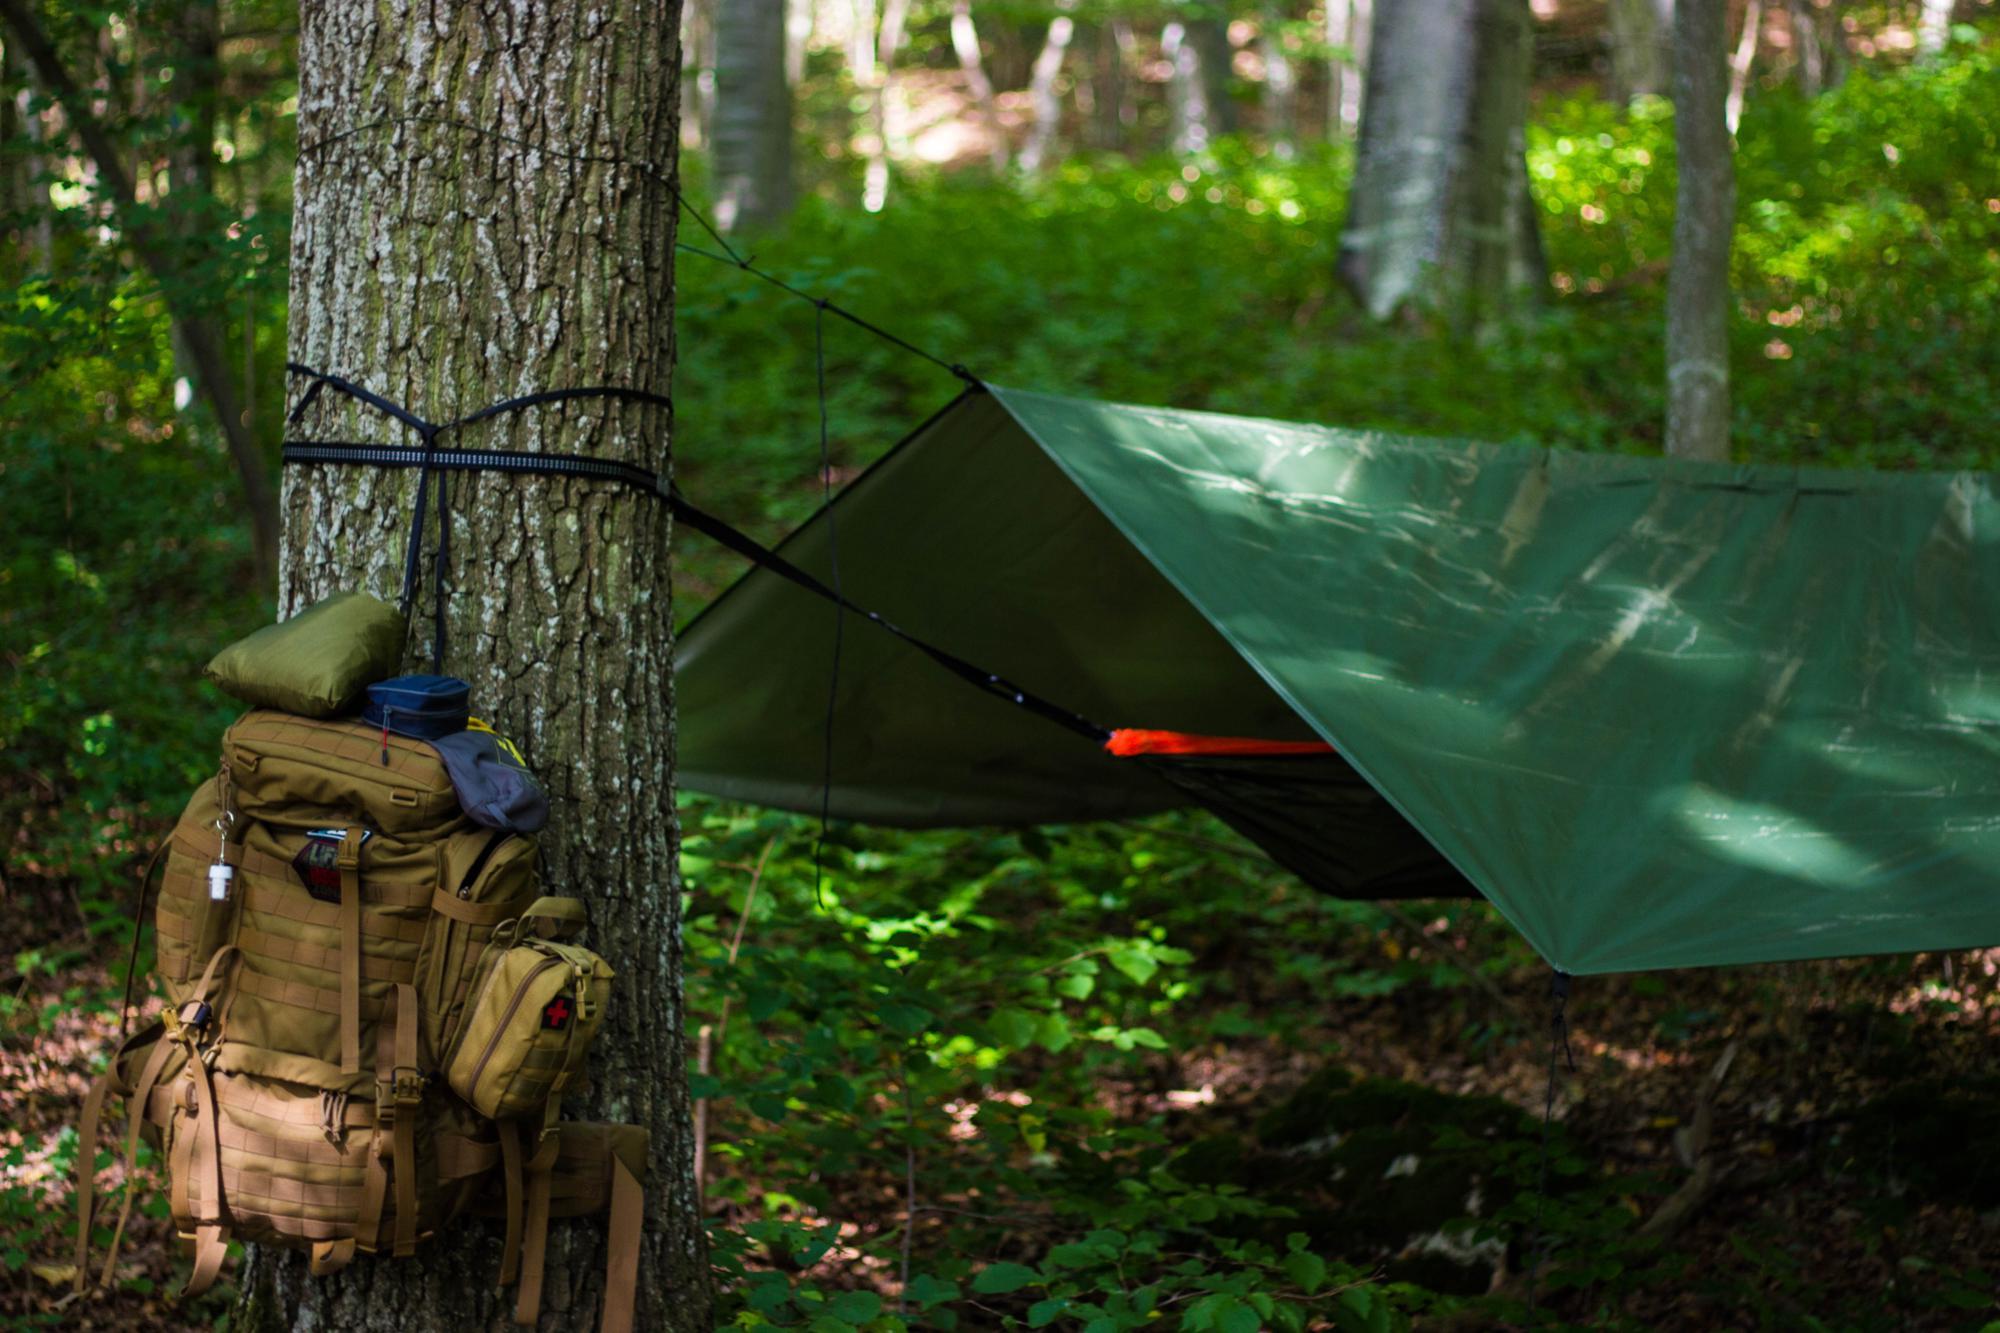 Secret wild camping spots in the UK